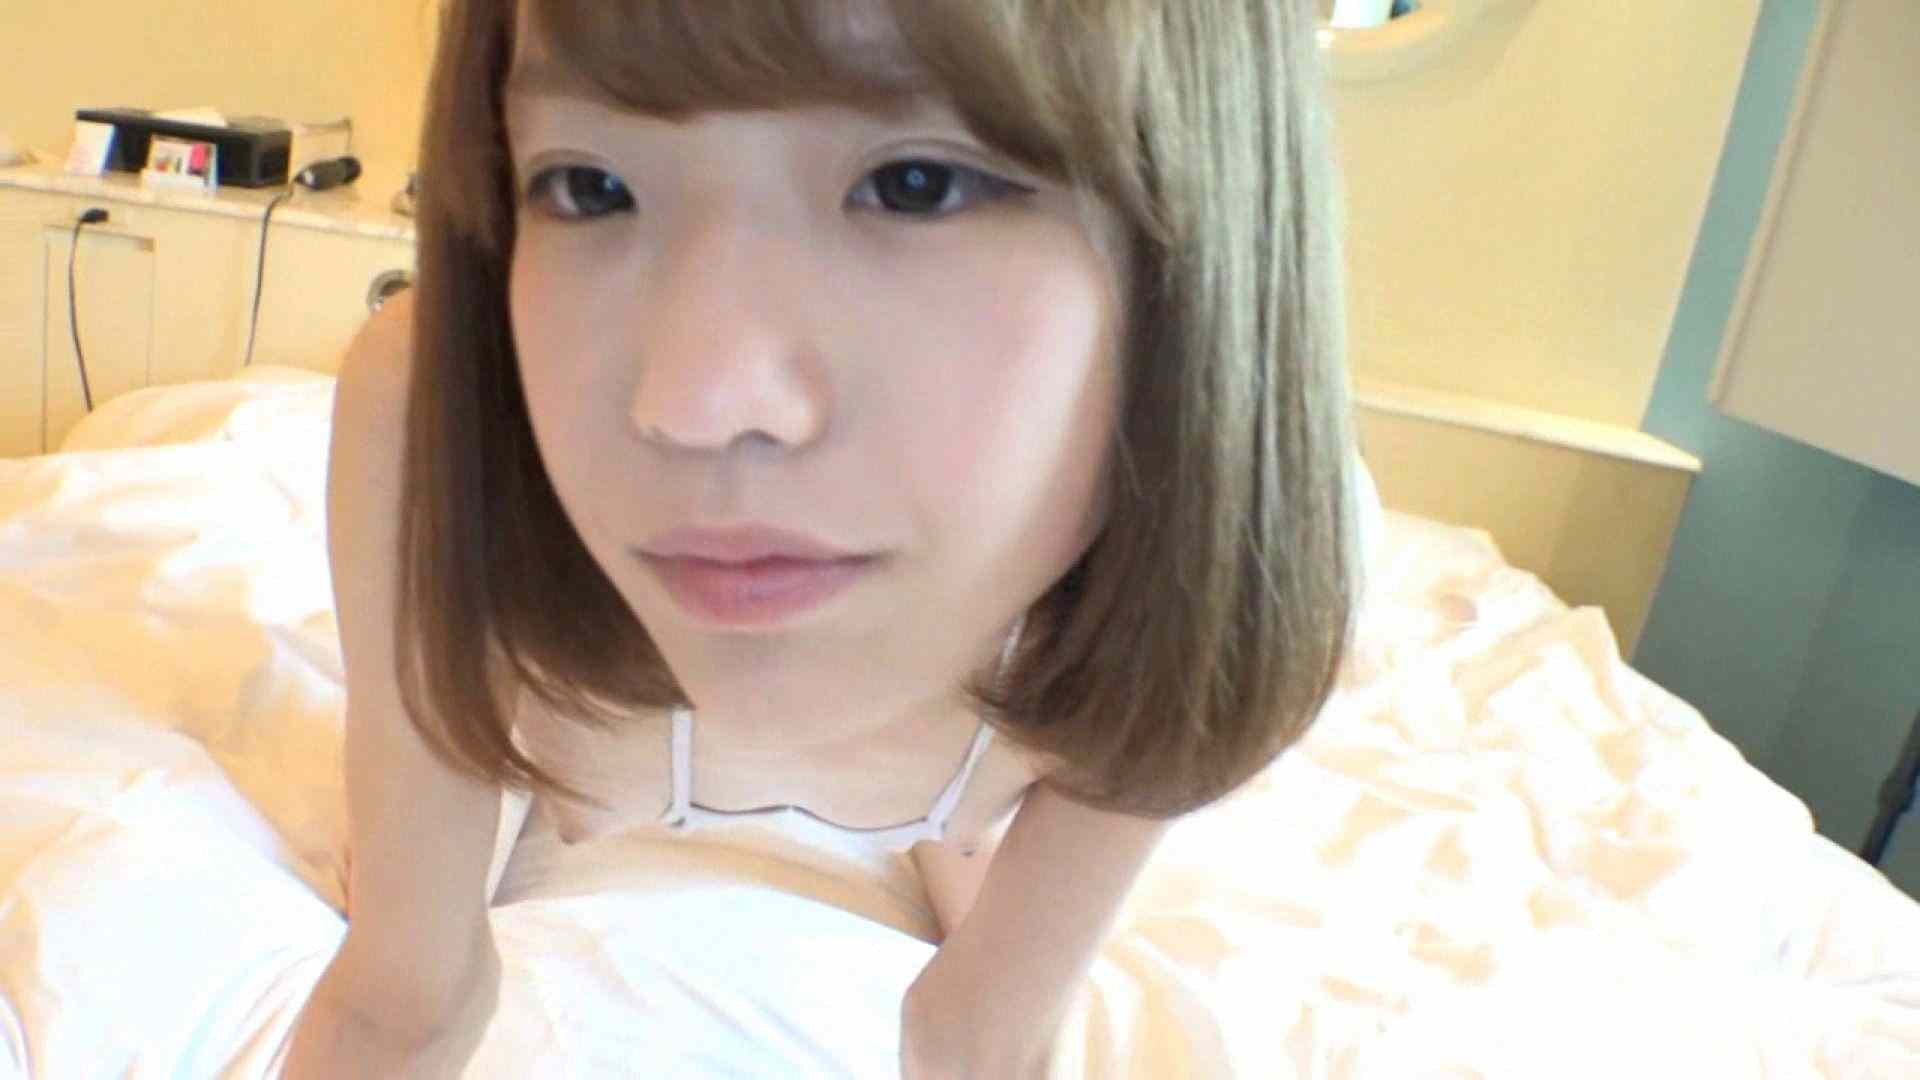 S級厳選美女ビッチガールVol.32 前編 モデルのエッチ 隠し撮りオマンコ動画紹介 109PIX 93